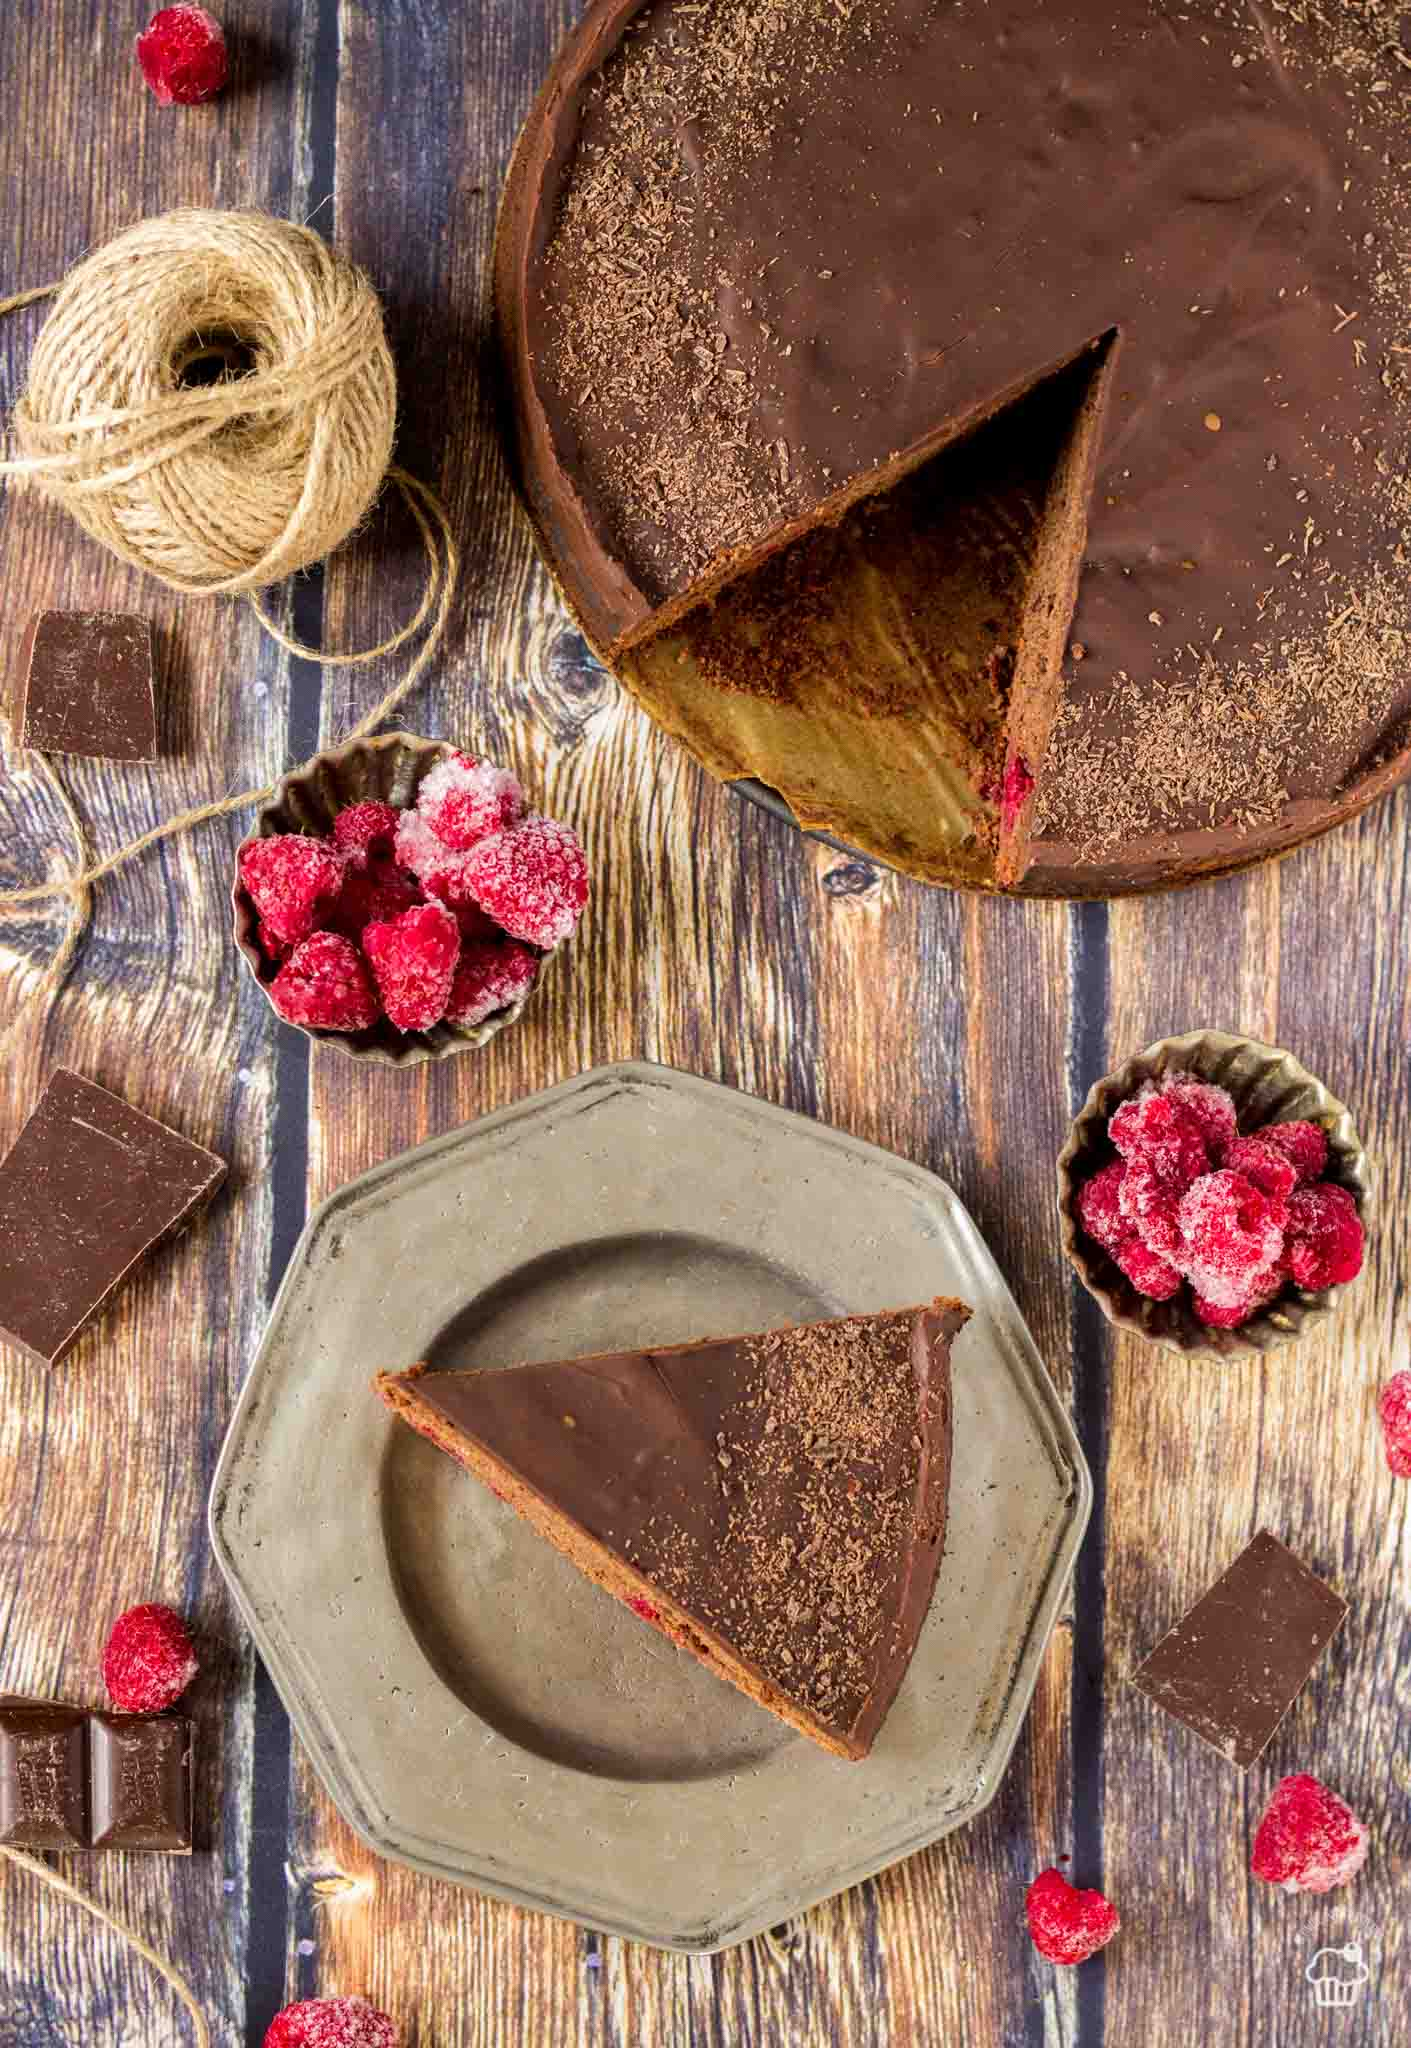 rýchly čokoládový koláč s malinami